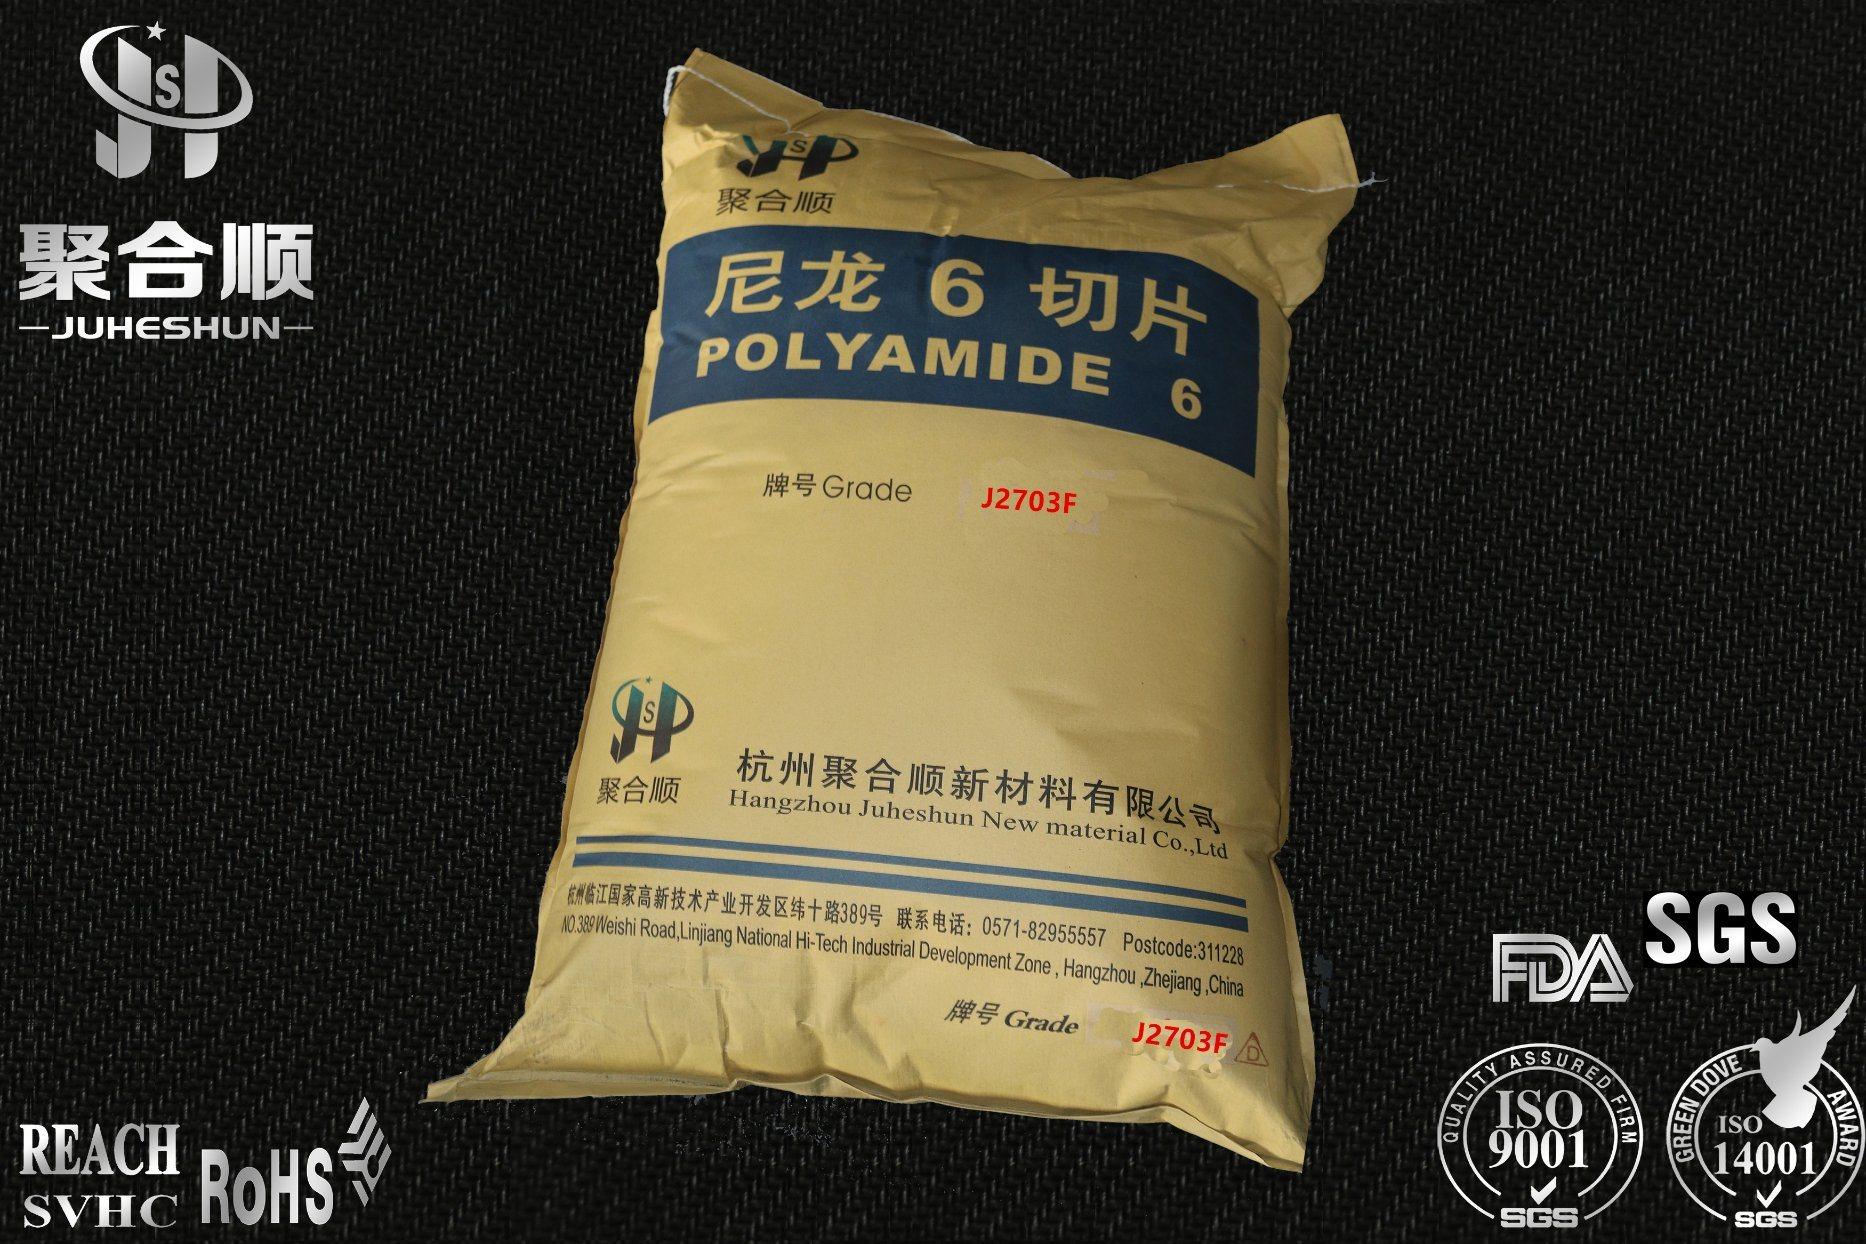 J2703f/ Nylon6/Polyamide Chips/Granules/Pellets/Polyamide 6 Granules//PA6